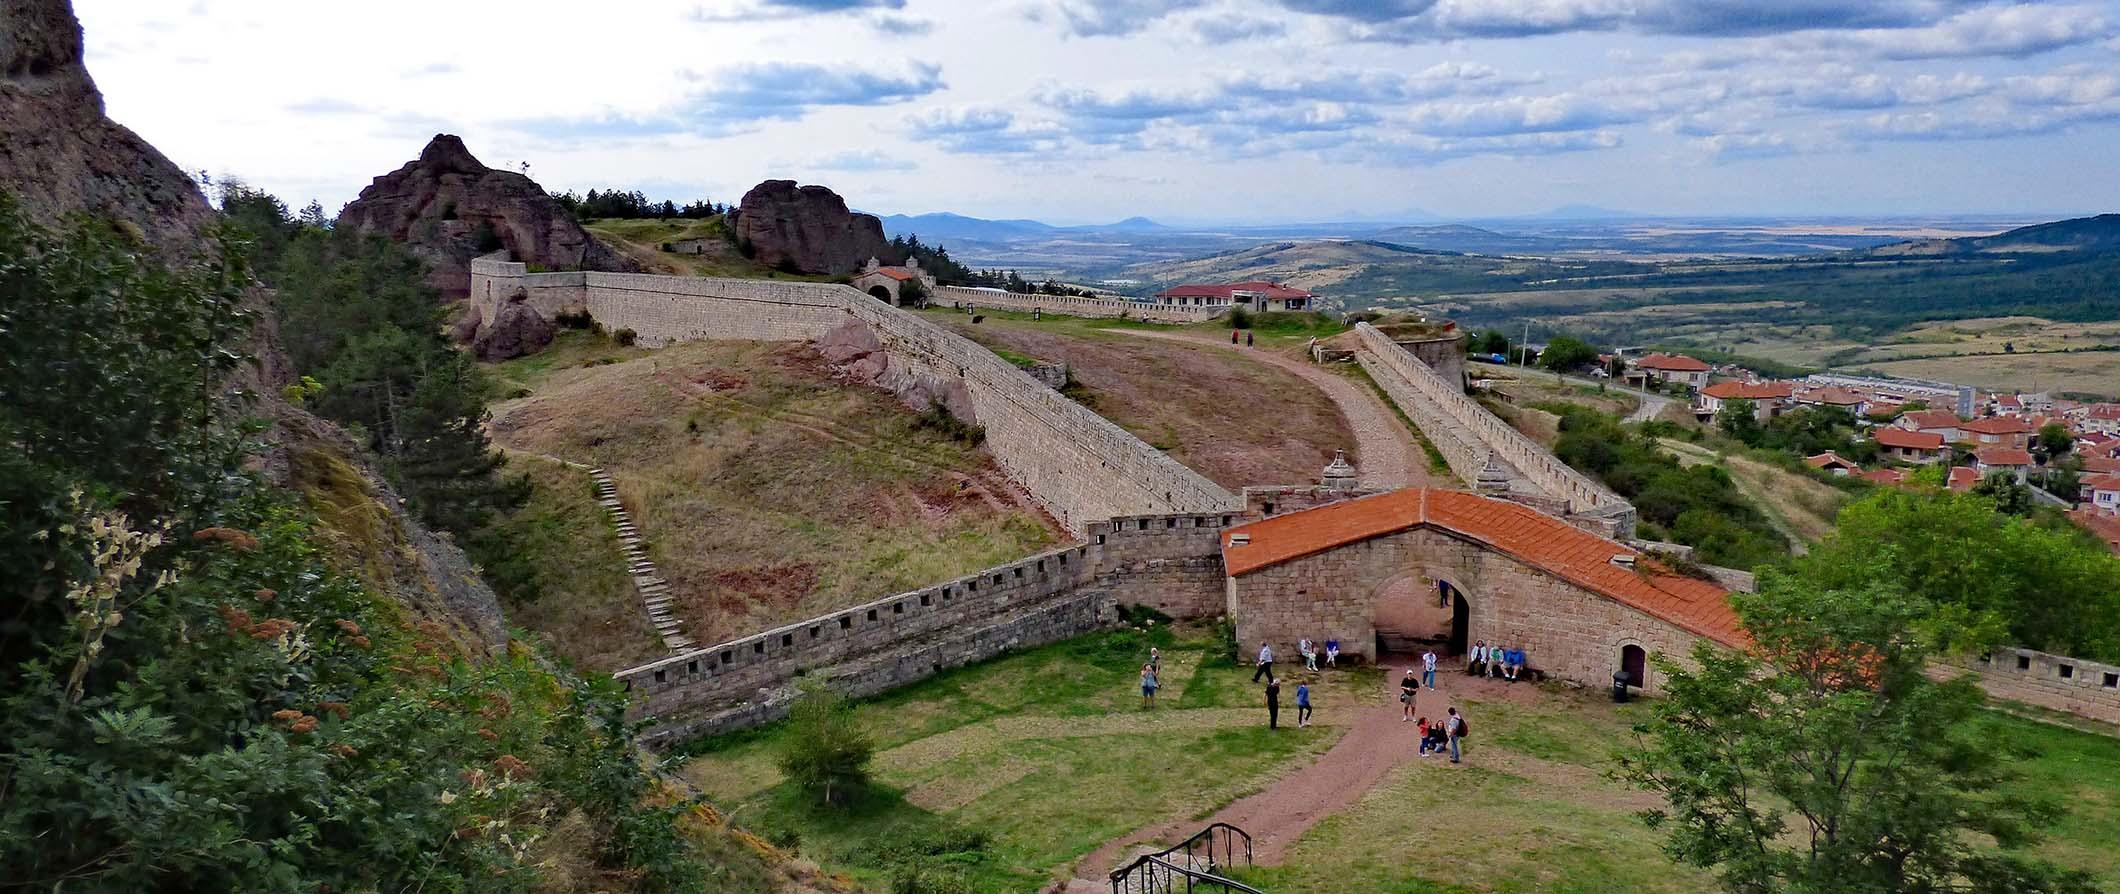 Tourism Minister Angelkova: Bulgaria Is A Safe Holiday Destination, Tourist Season Starts On July 1